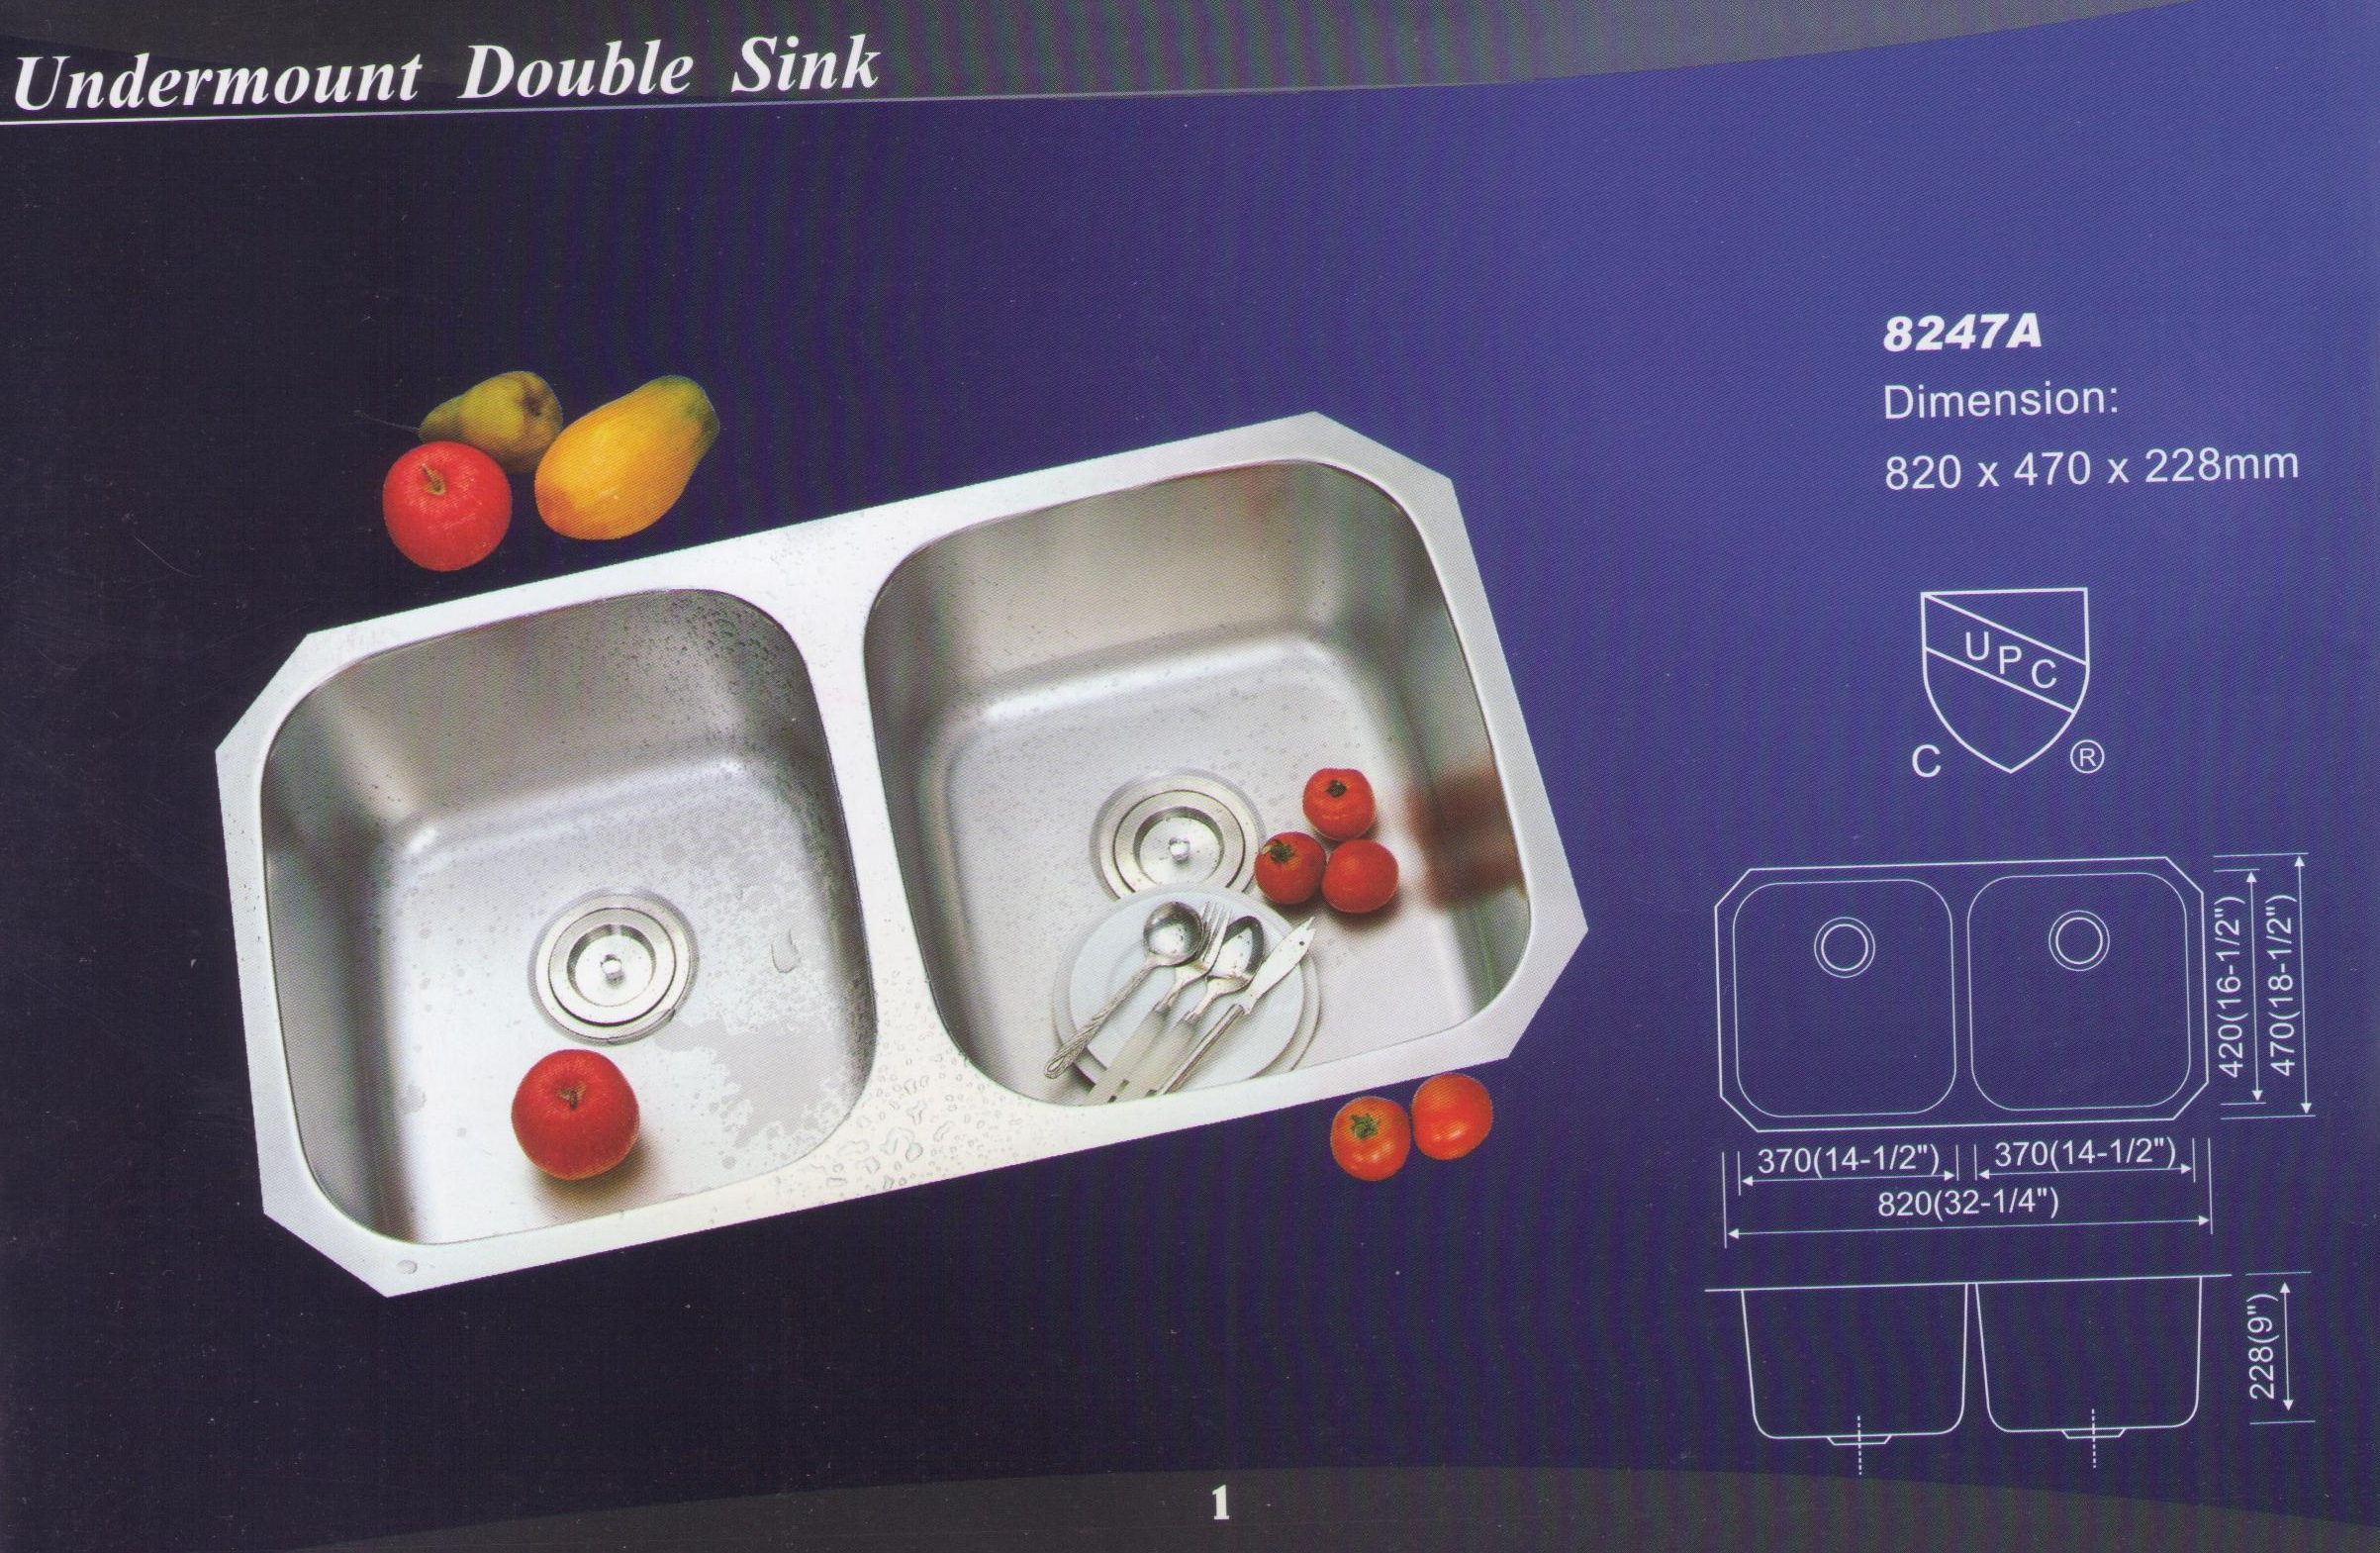 Sinks #8247